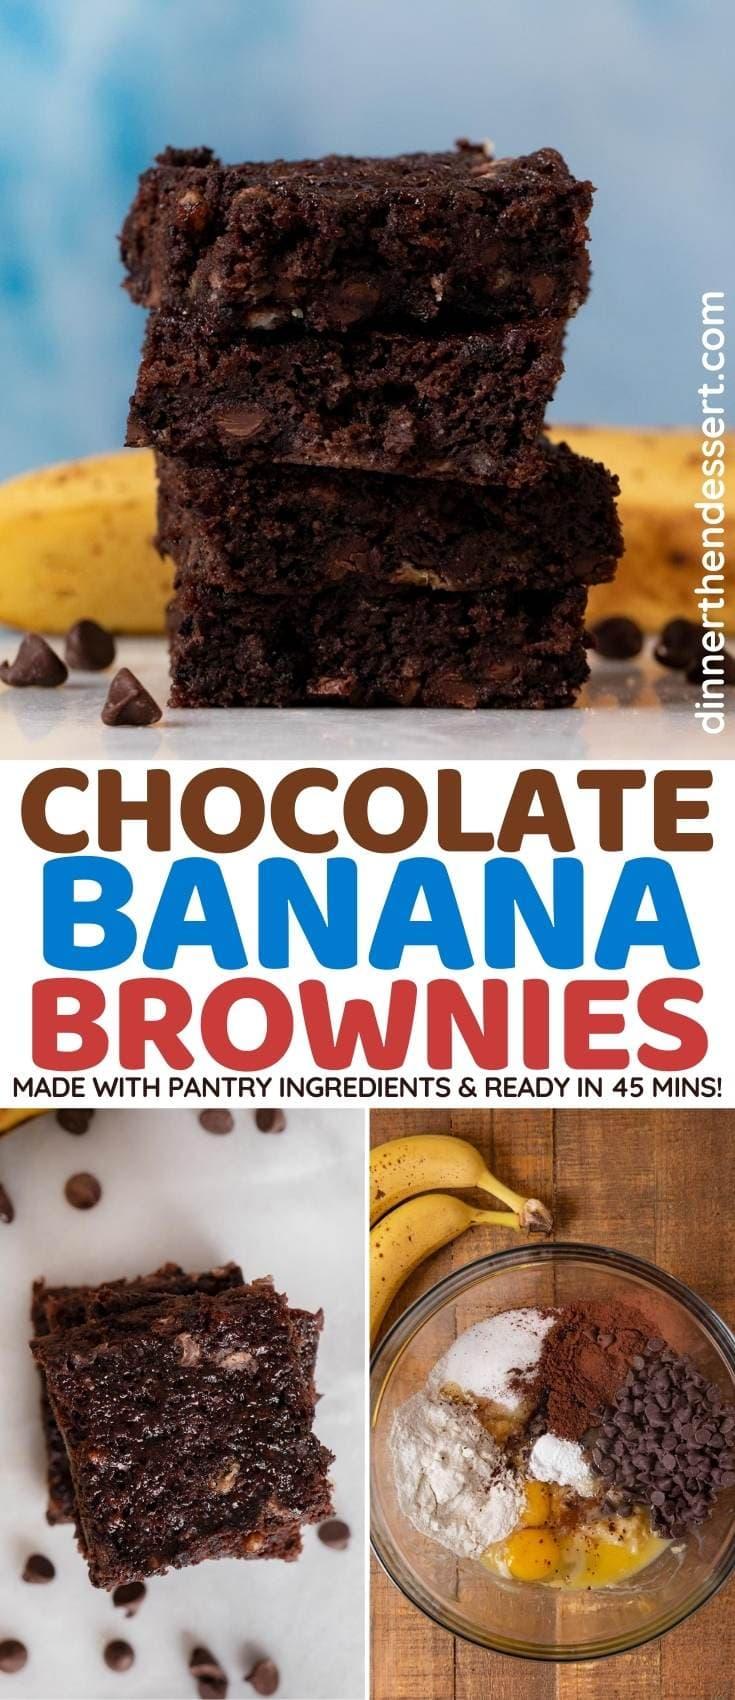 Chocolate Banana Brownies collage